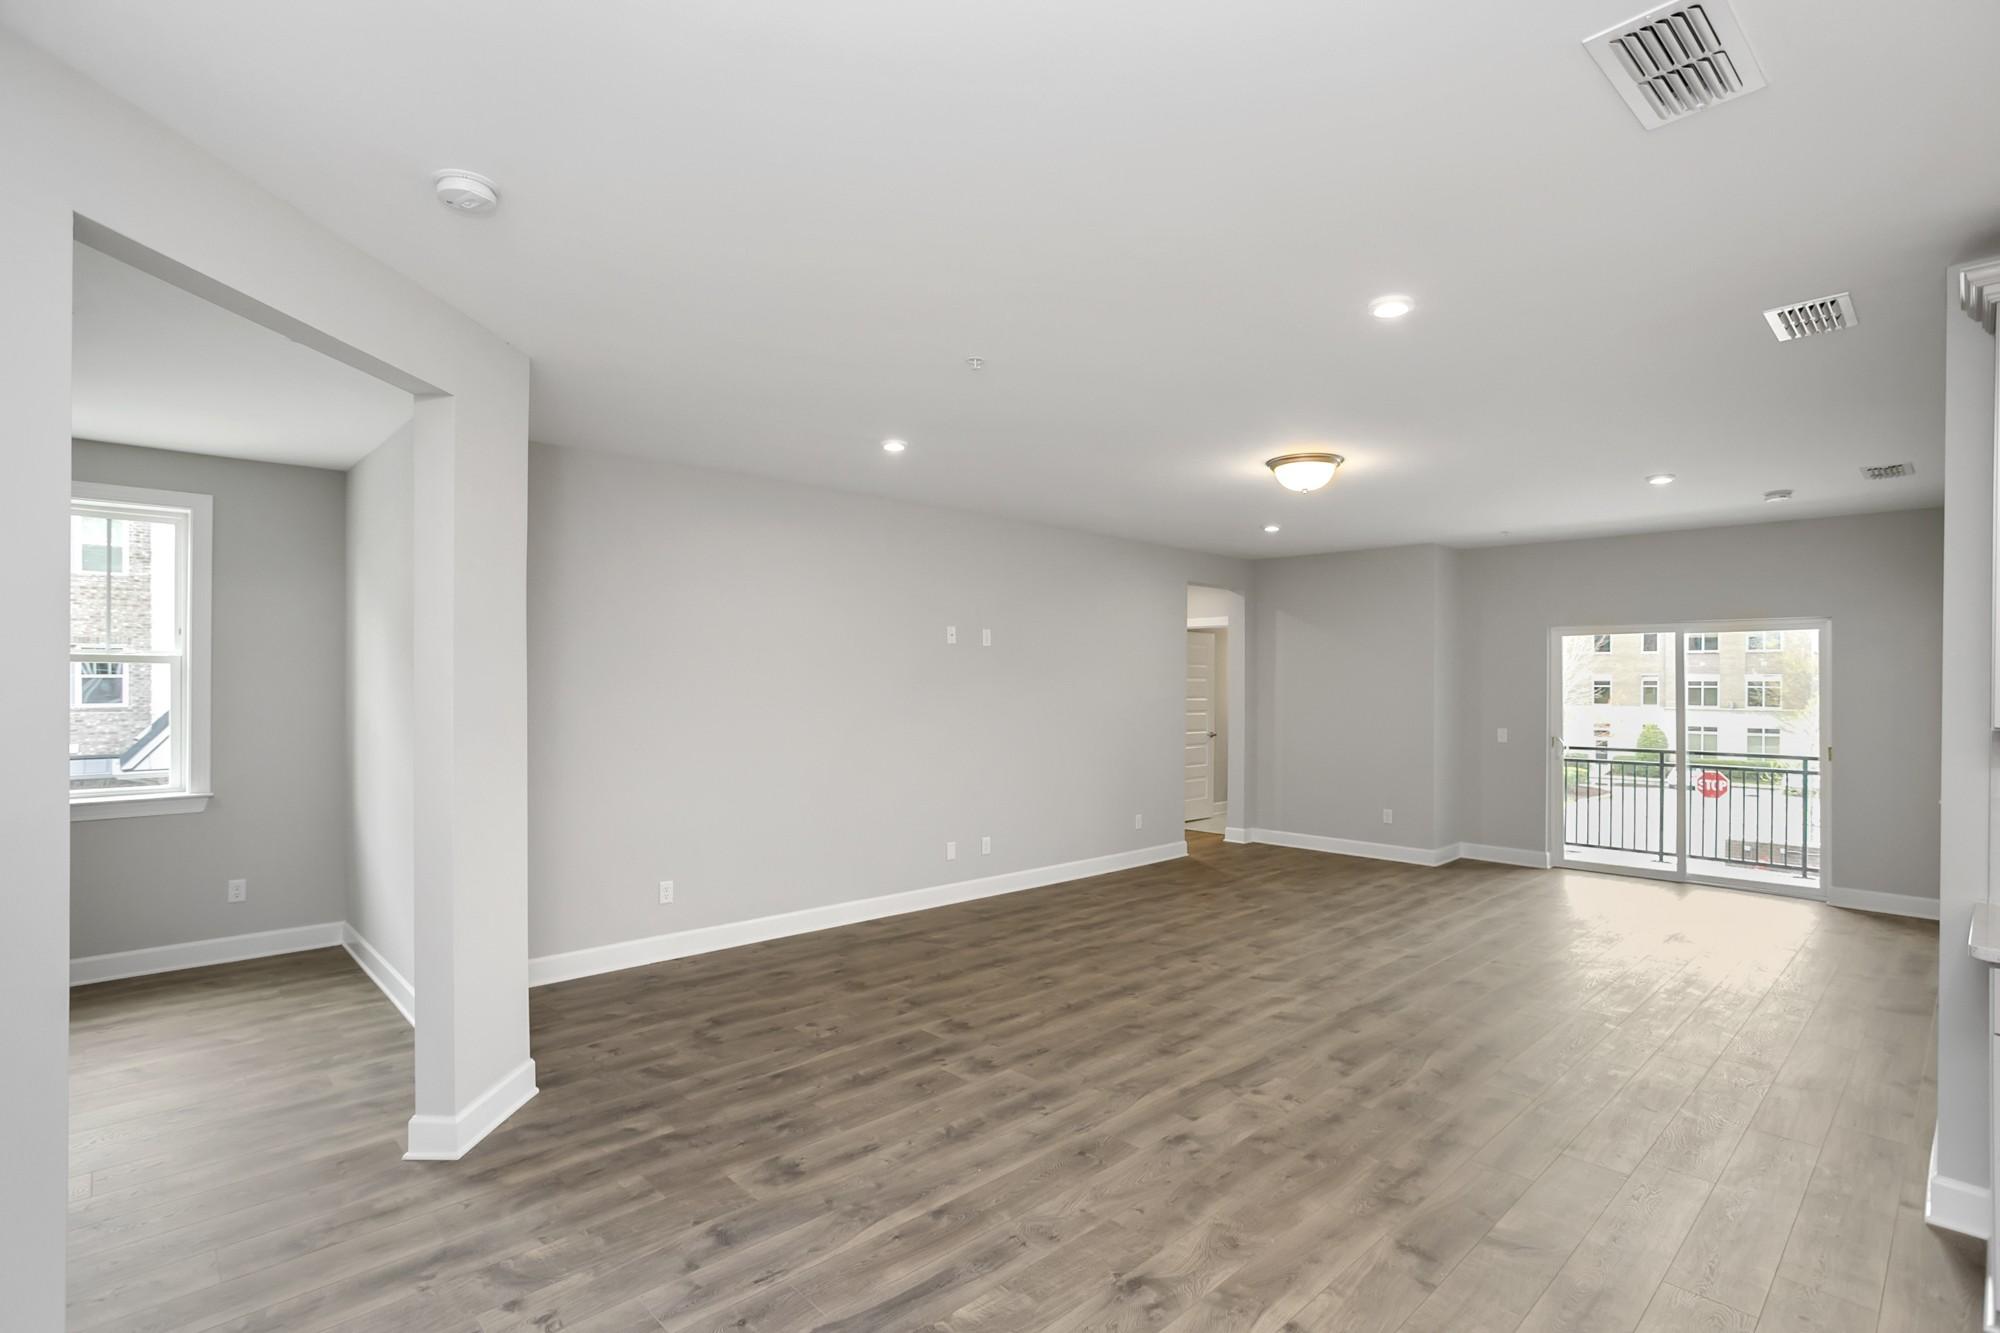 141 Saundersville Rd #2207 Property Photo - Hendersonville, TN real estate listing